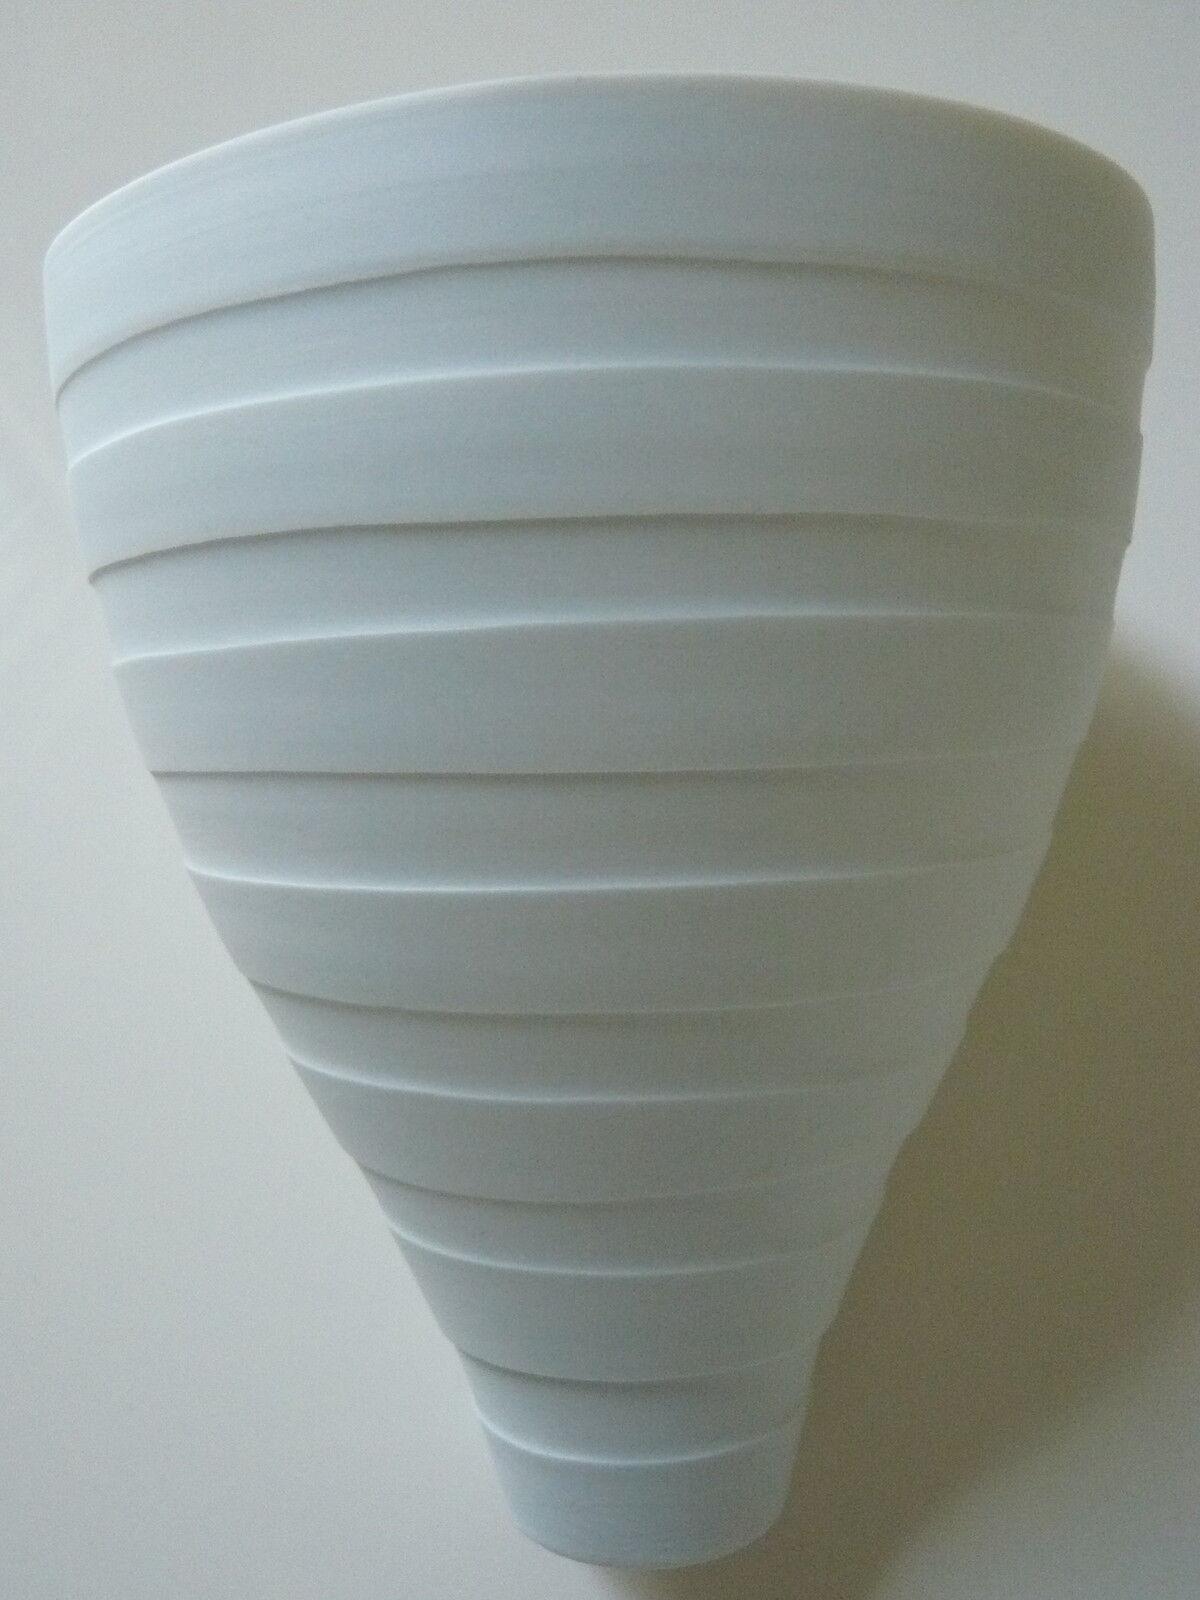 Hering Berlin Vase Kumme Porzellan weiss breite Querstreifen Biskuitporzellan